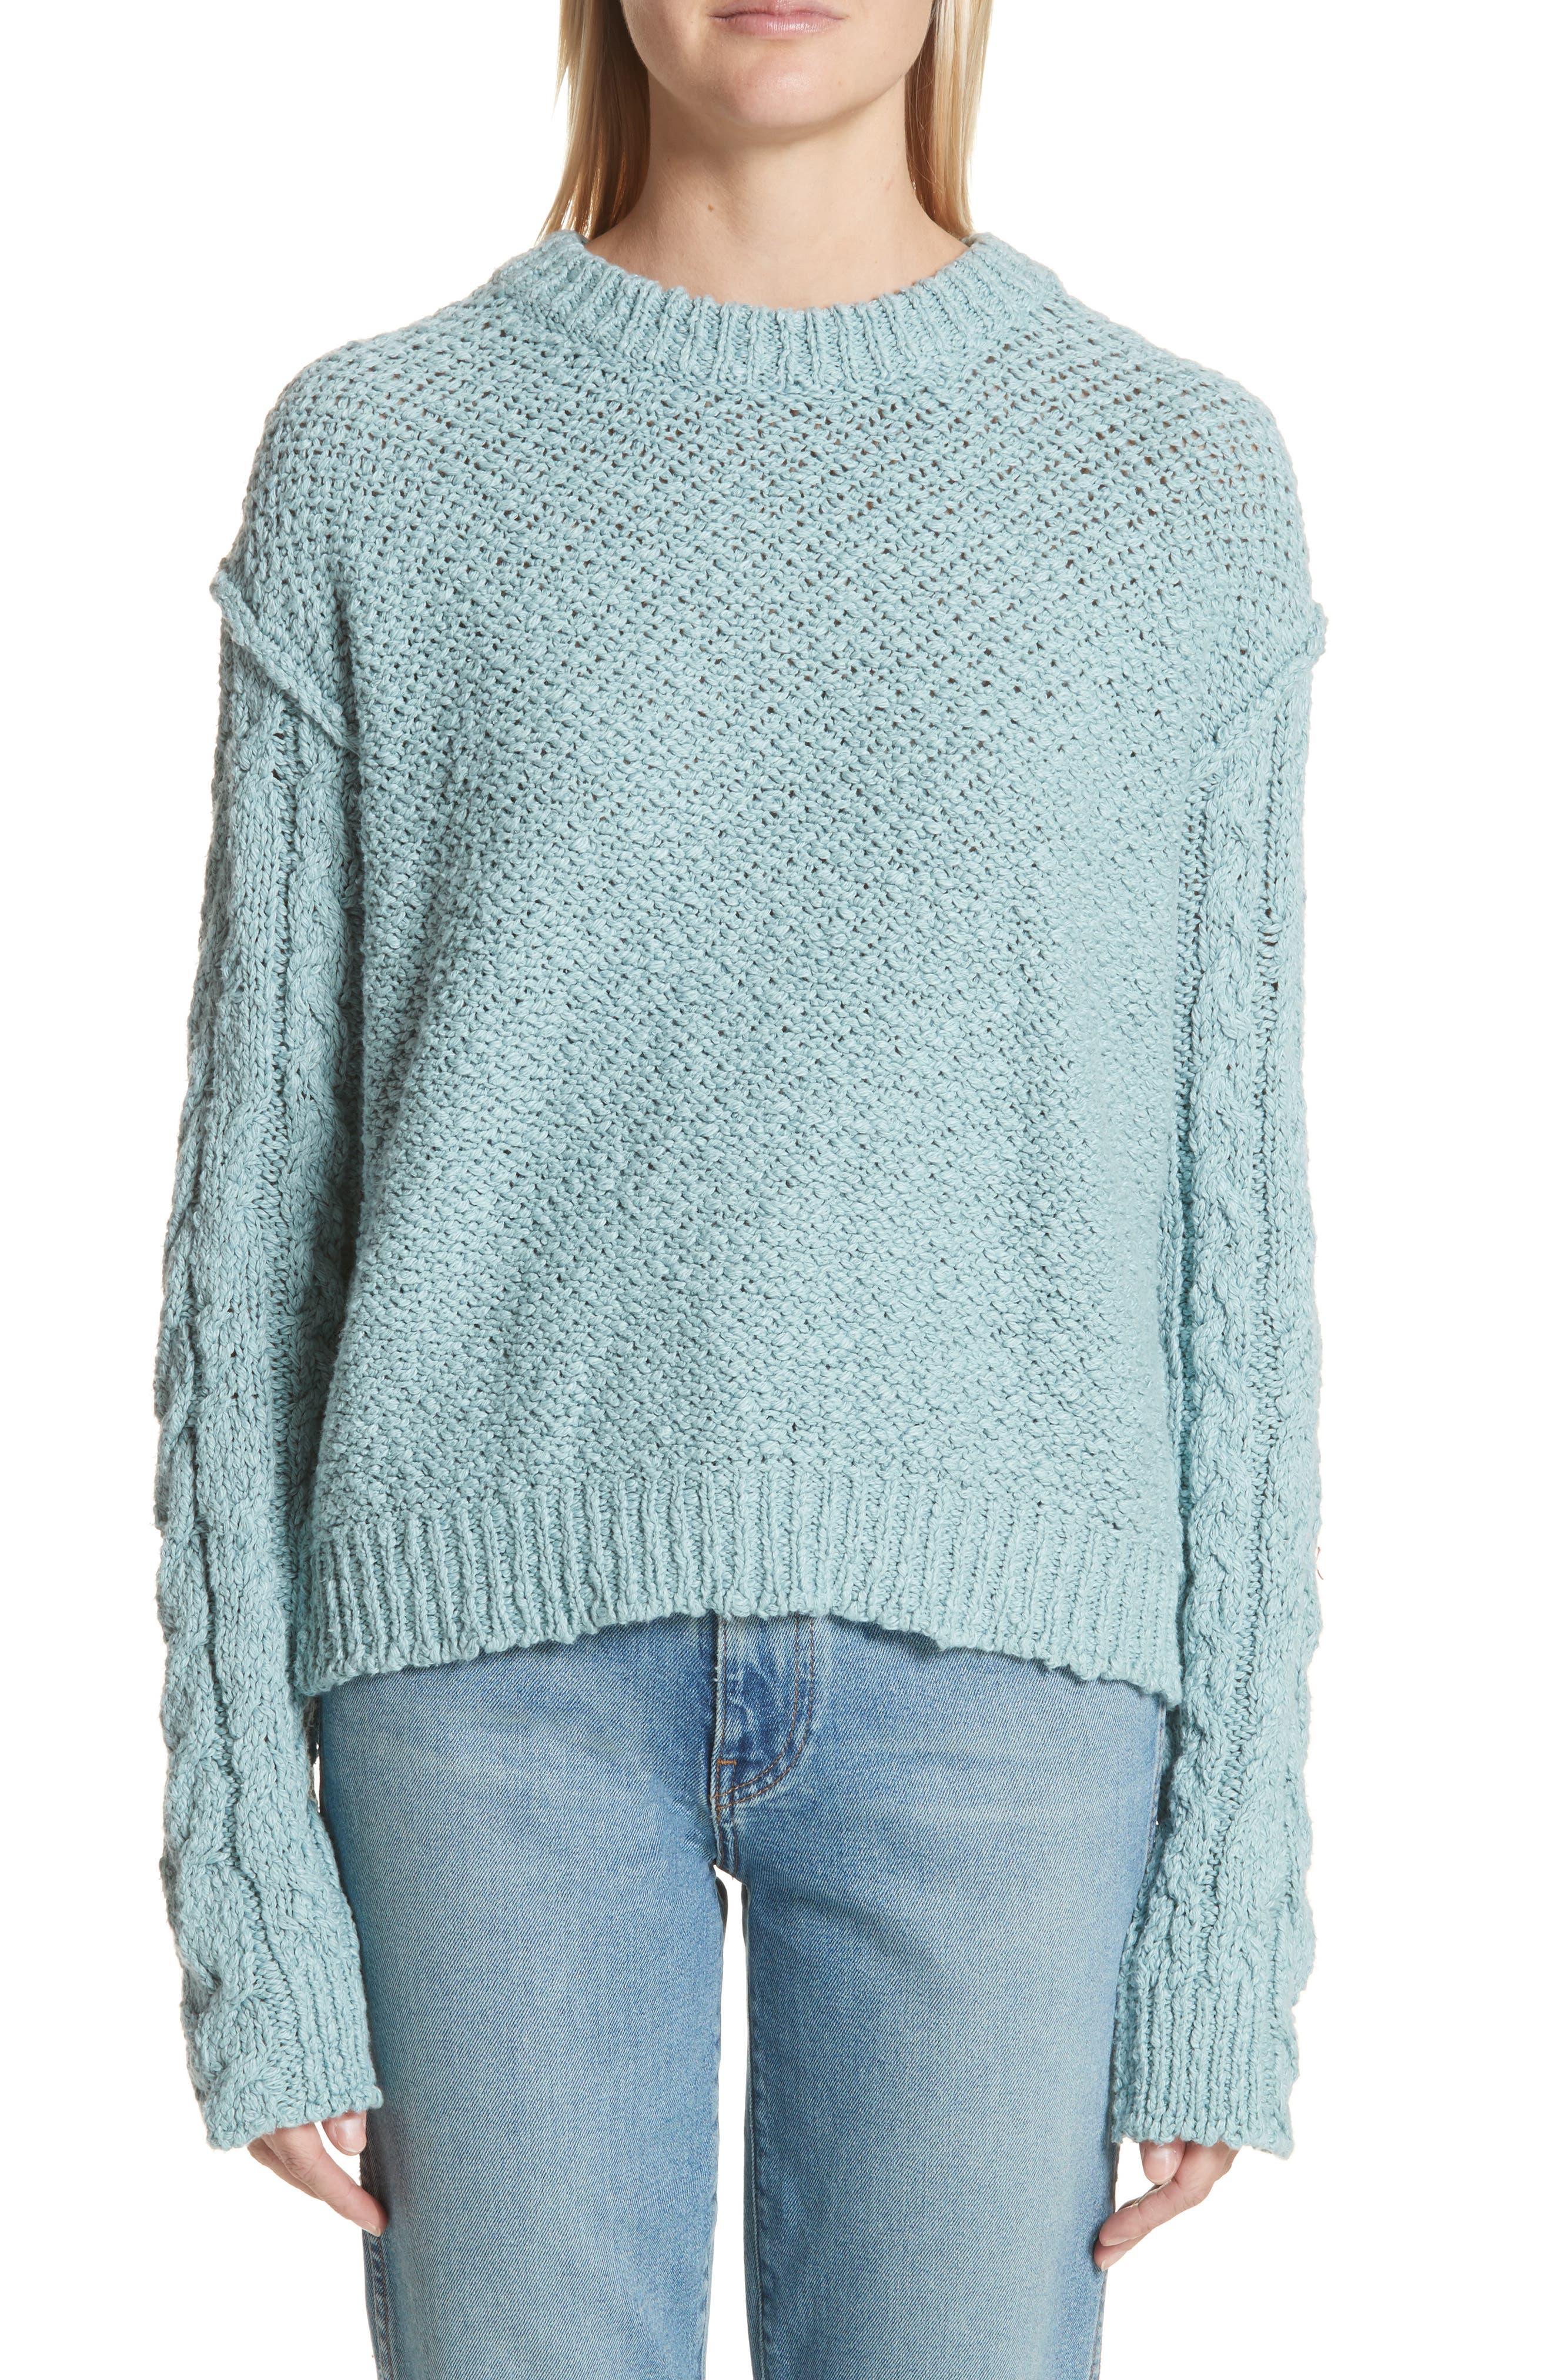 Hila Cable Sleeve Sweater,                             Main thumbnail 1, color,                             400